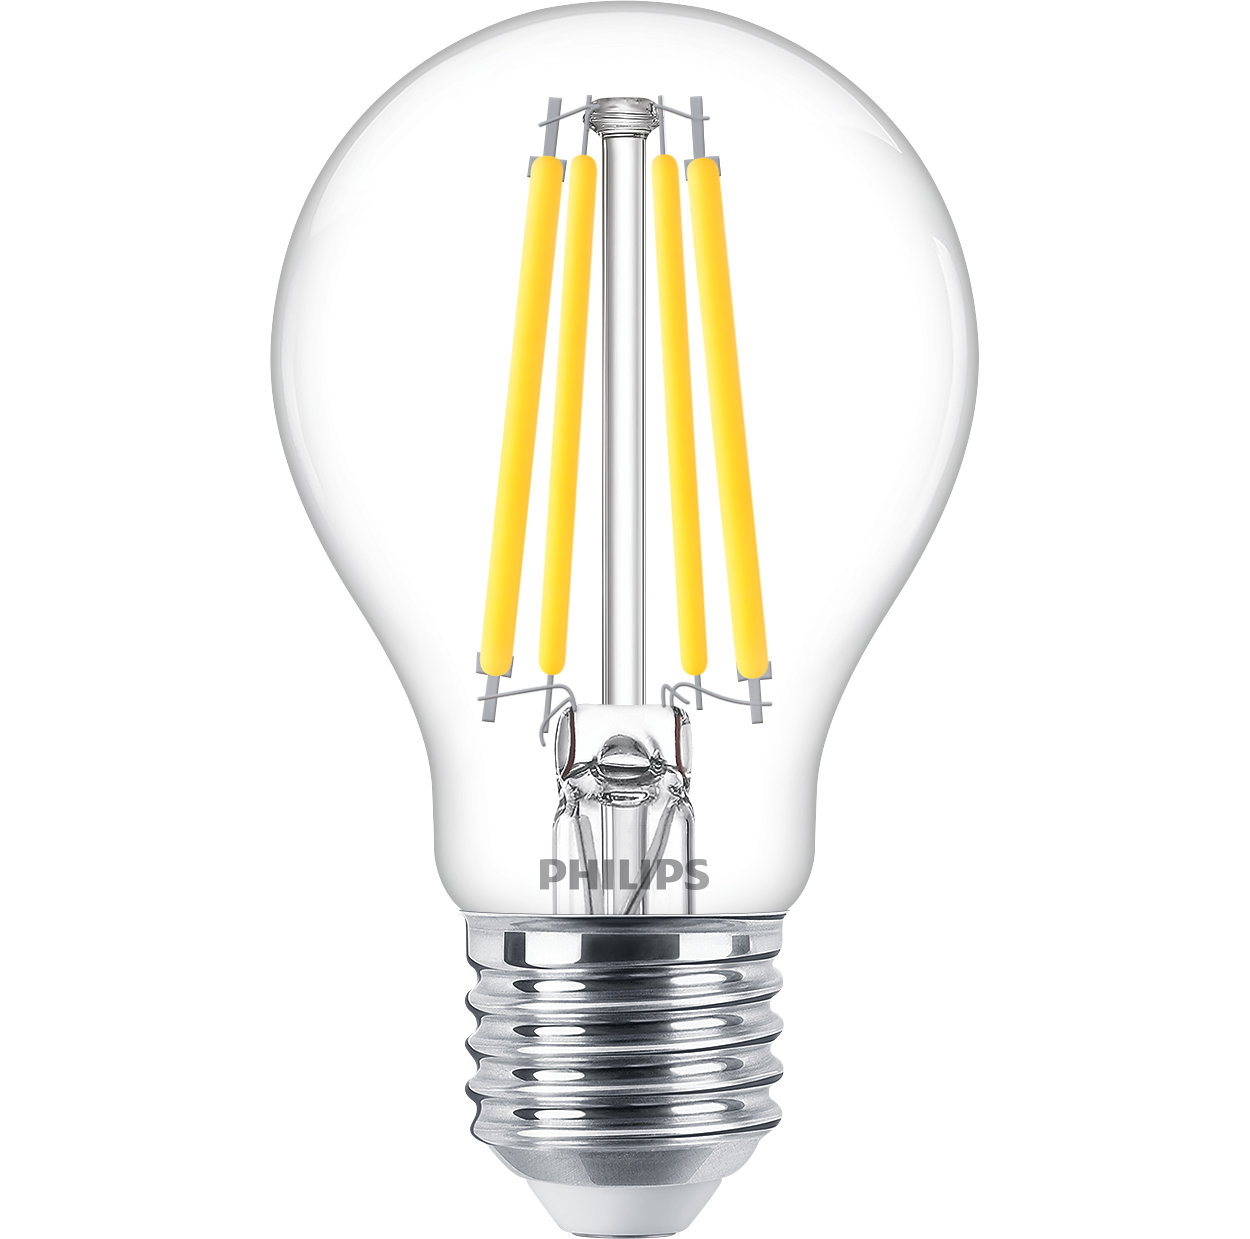 Classic LED for dekorativ belysning